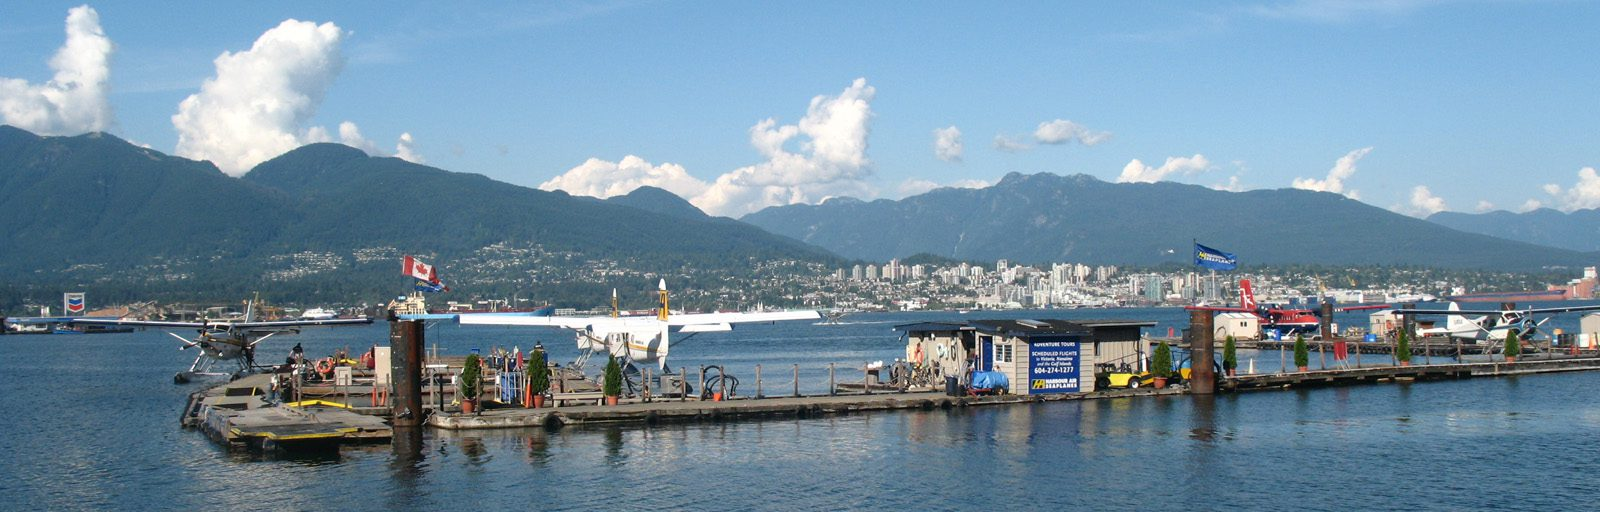 Vancouver - Floatplane docks and North Shore Mountains sliver